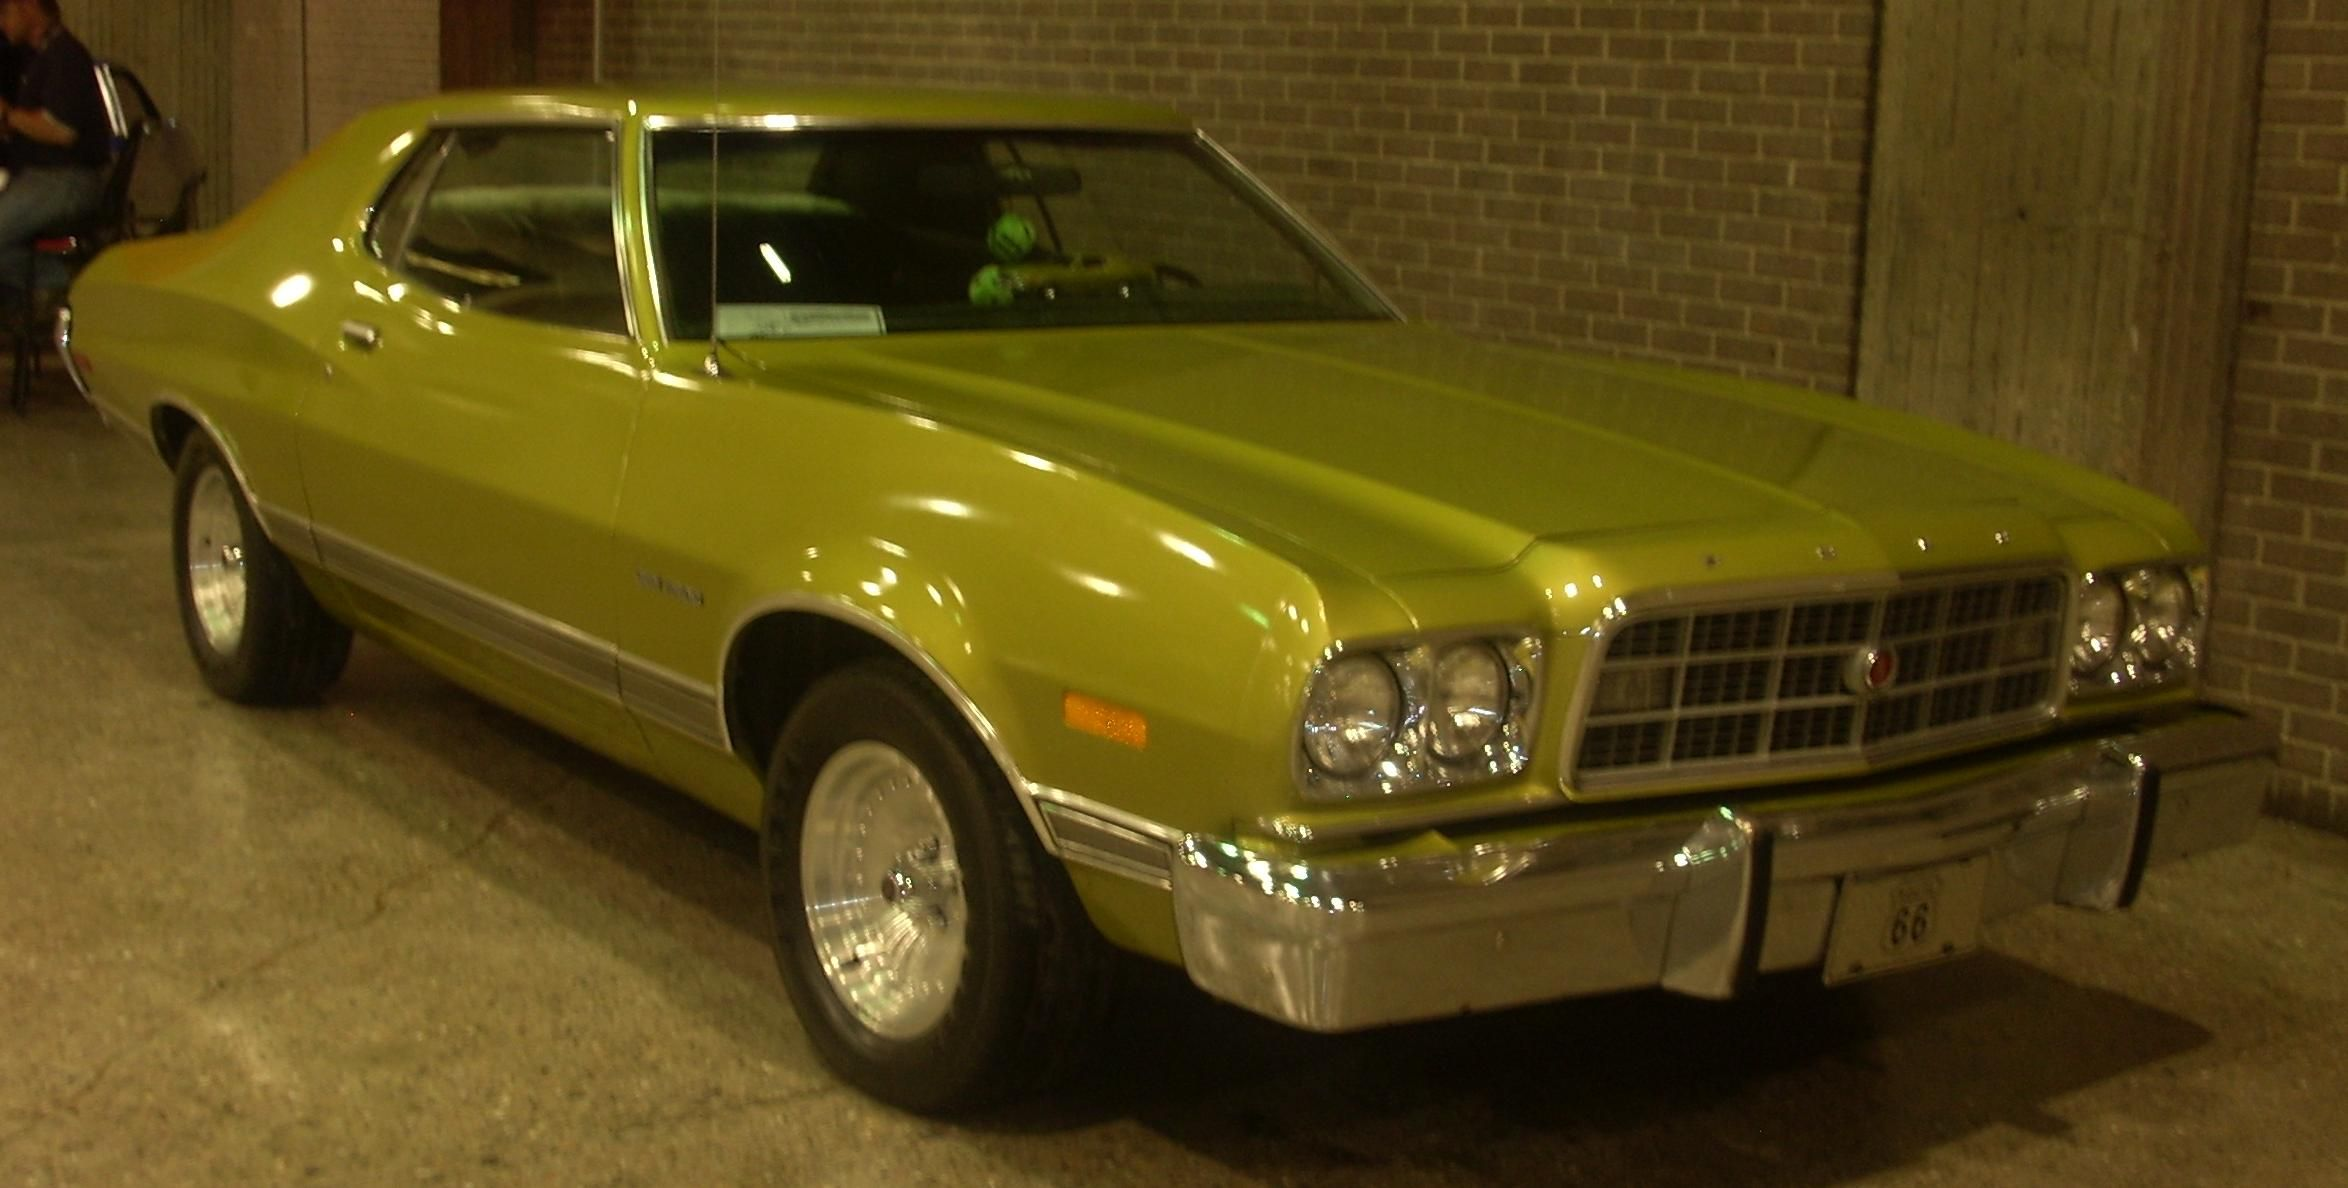 1973 ford gran torino 2 door hardtop